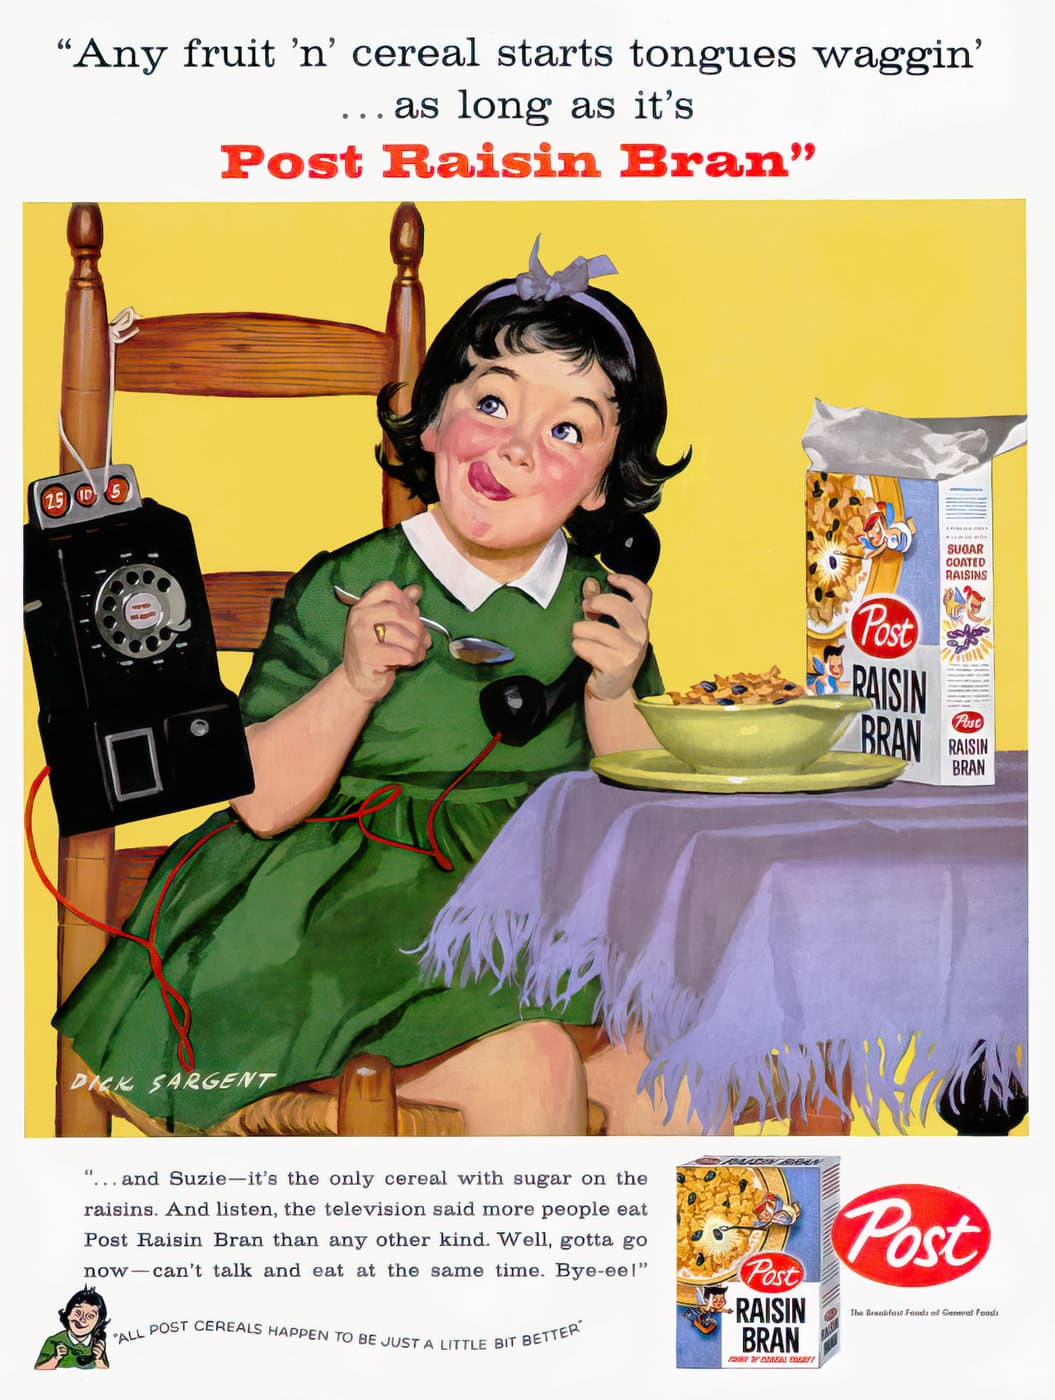 1950s Post Raisin Bran cereal